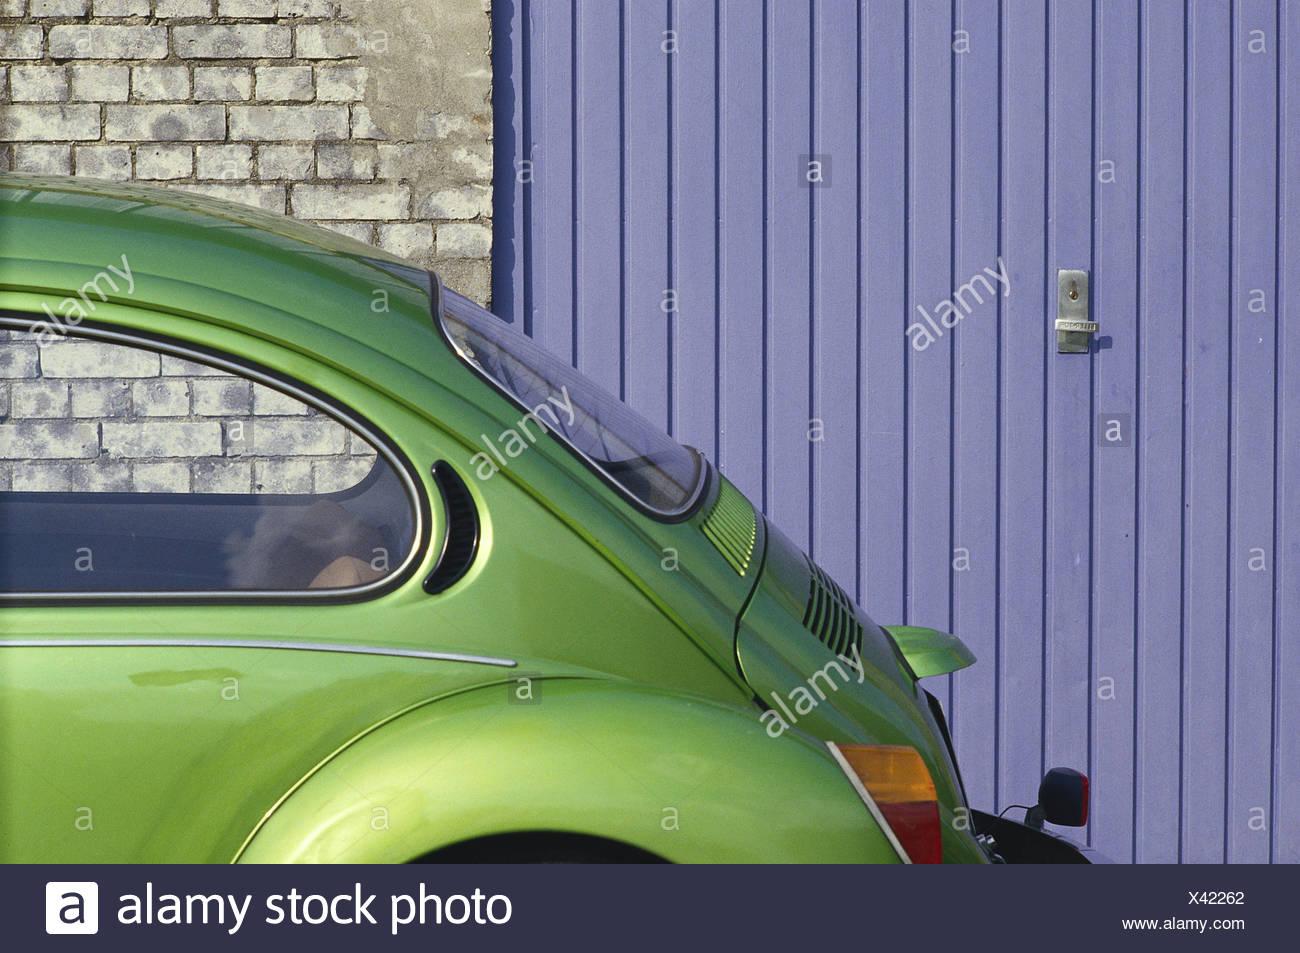 VW Beetle, Garage Door, Defensive Wall, Detail, No Property Release,  Preview, Rear Window, Back, Window, Window Pane, Green, Blue,